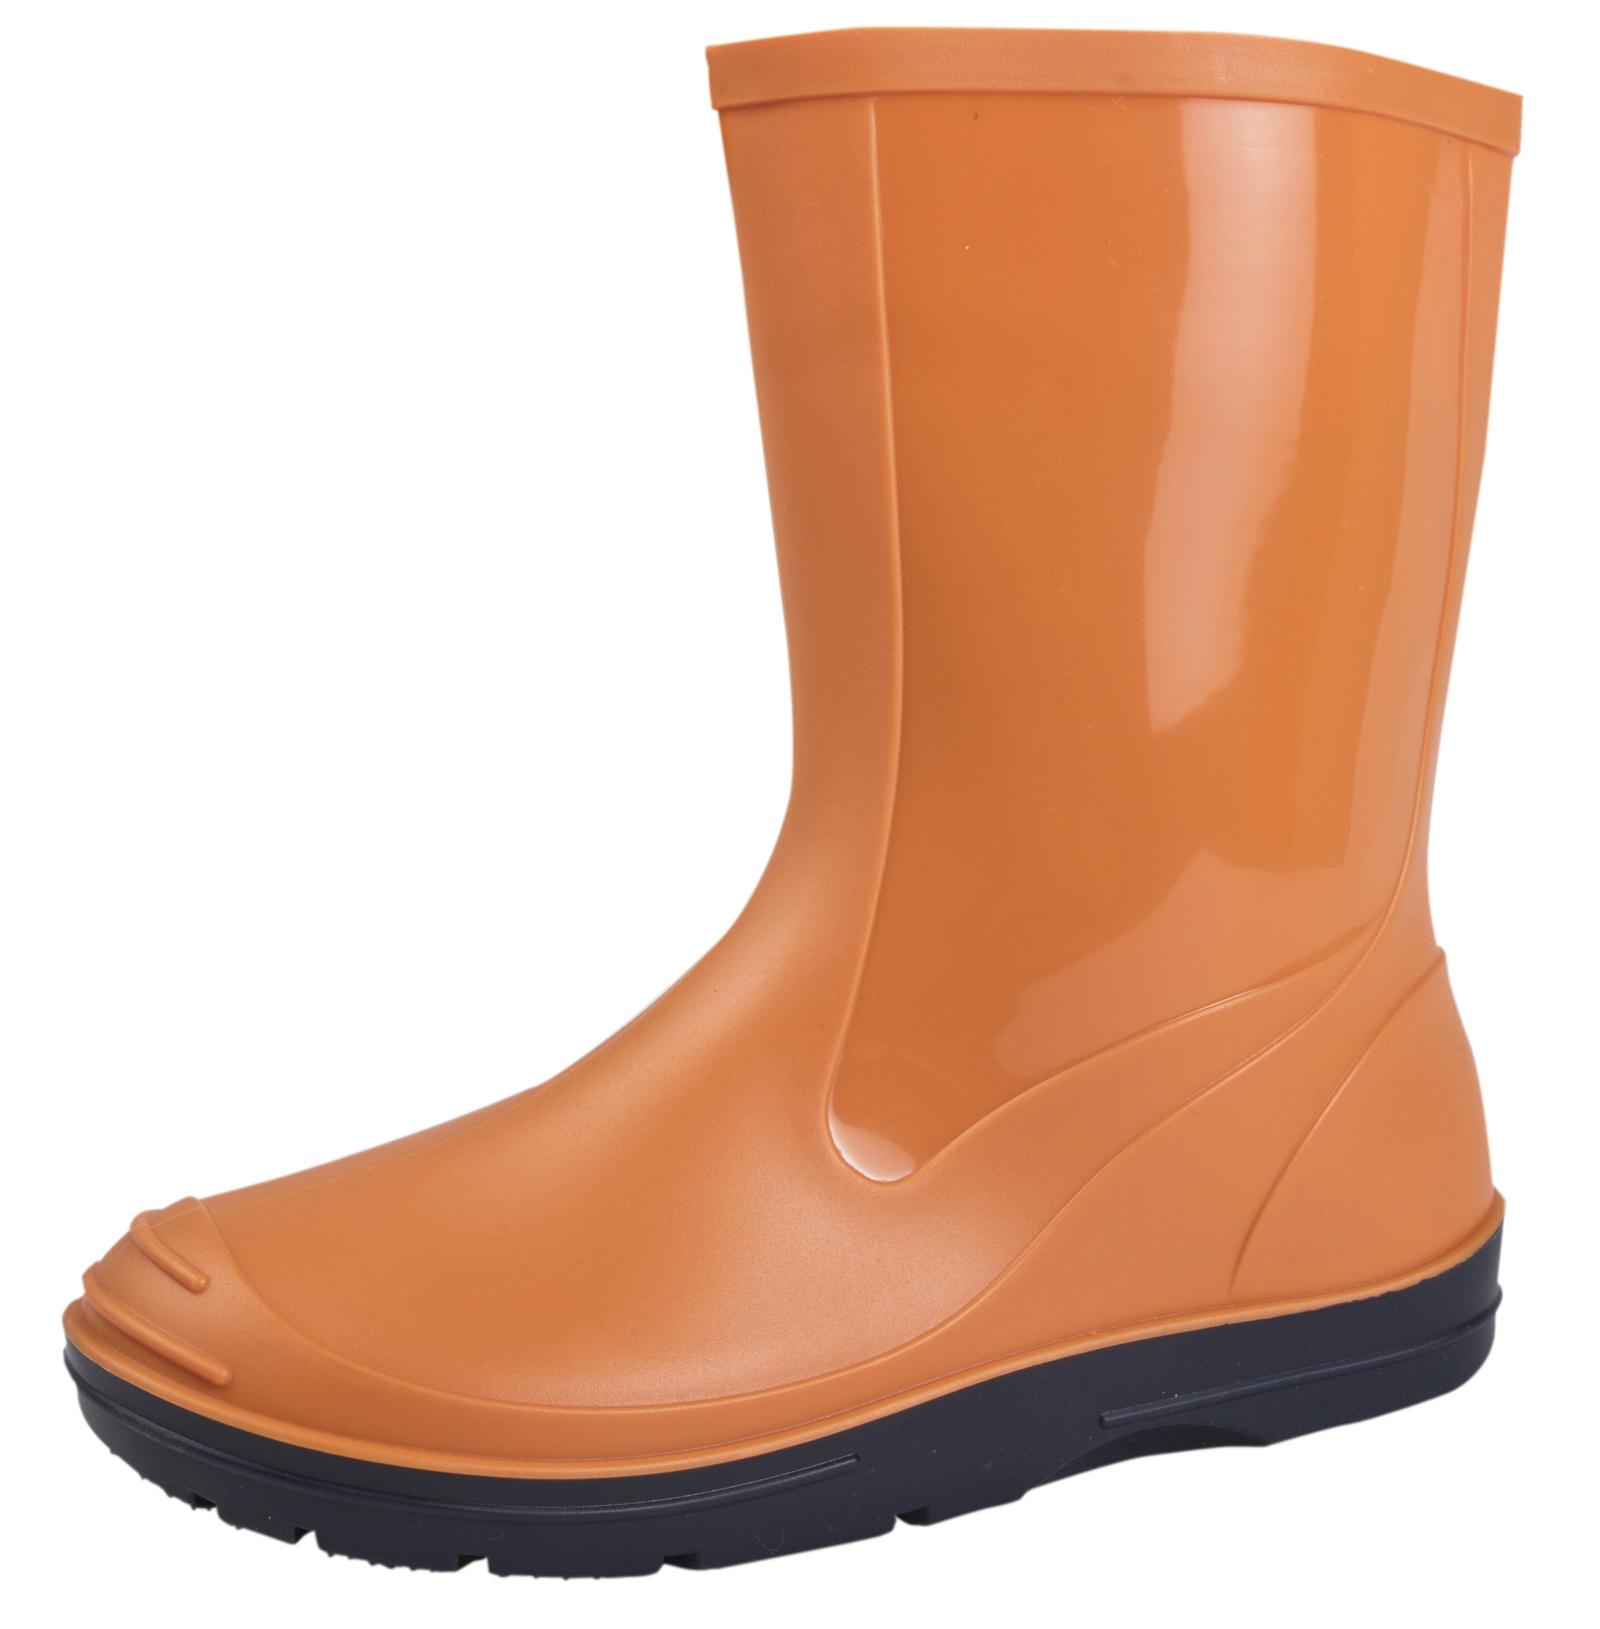 Boys Girls Wellington Boots Kids Rain Snow Boots Warm